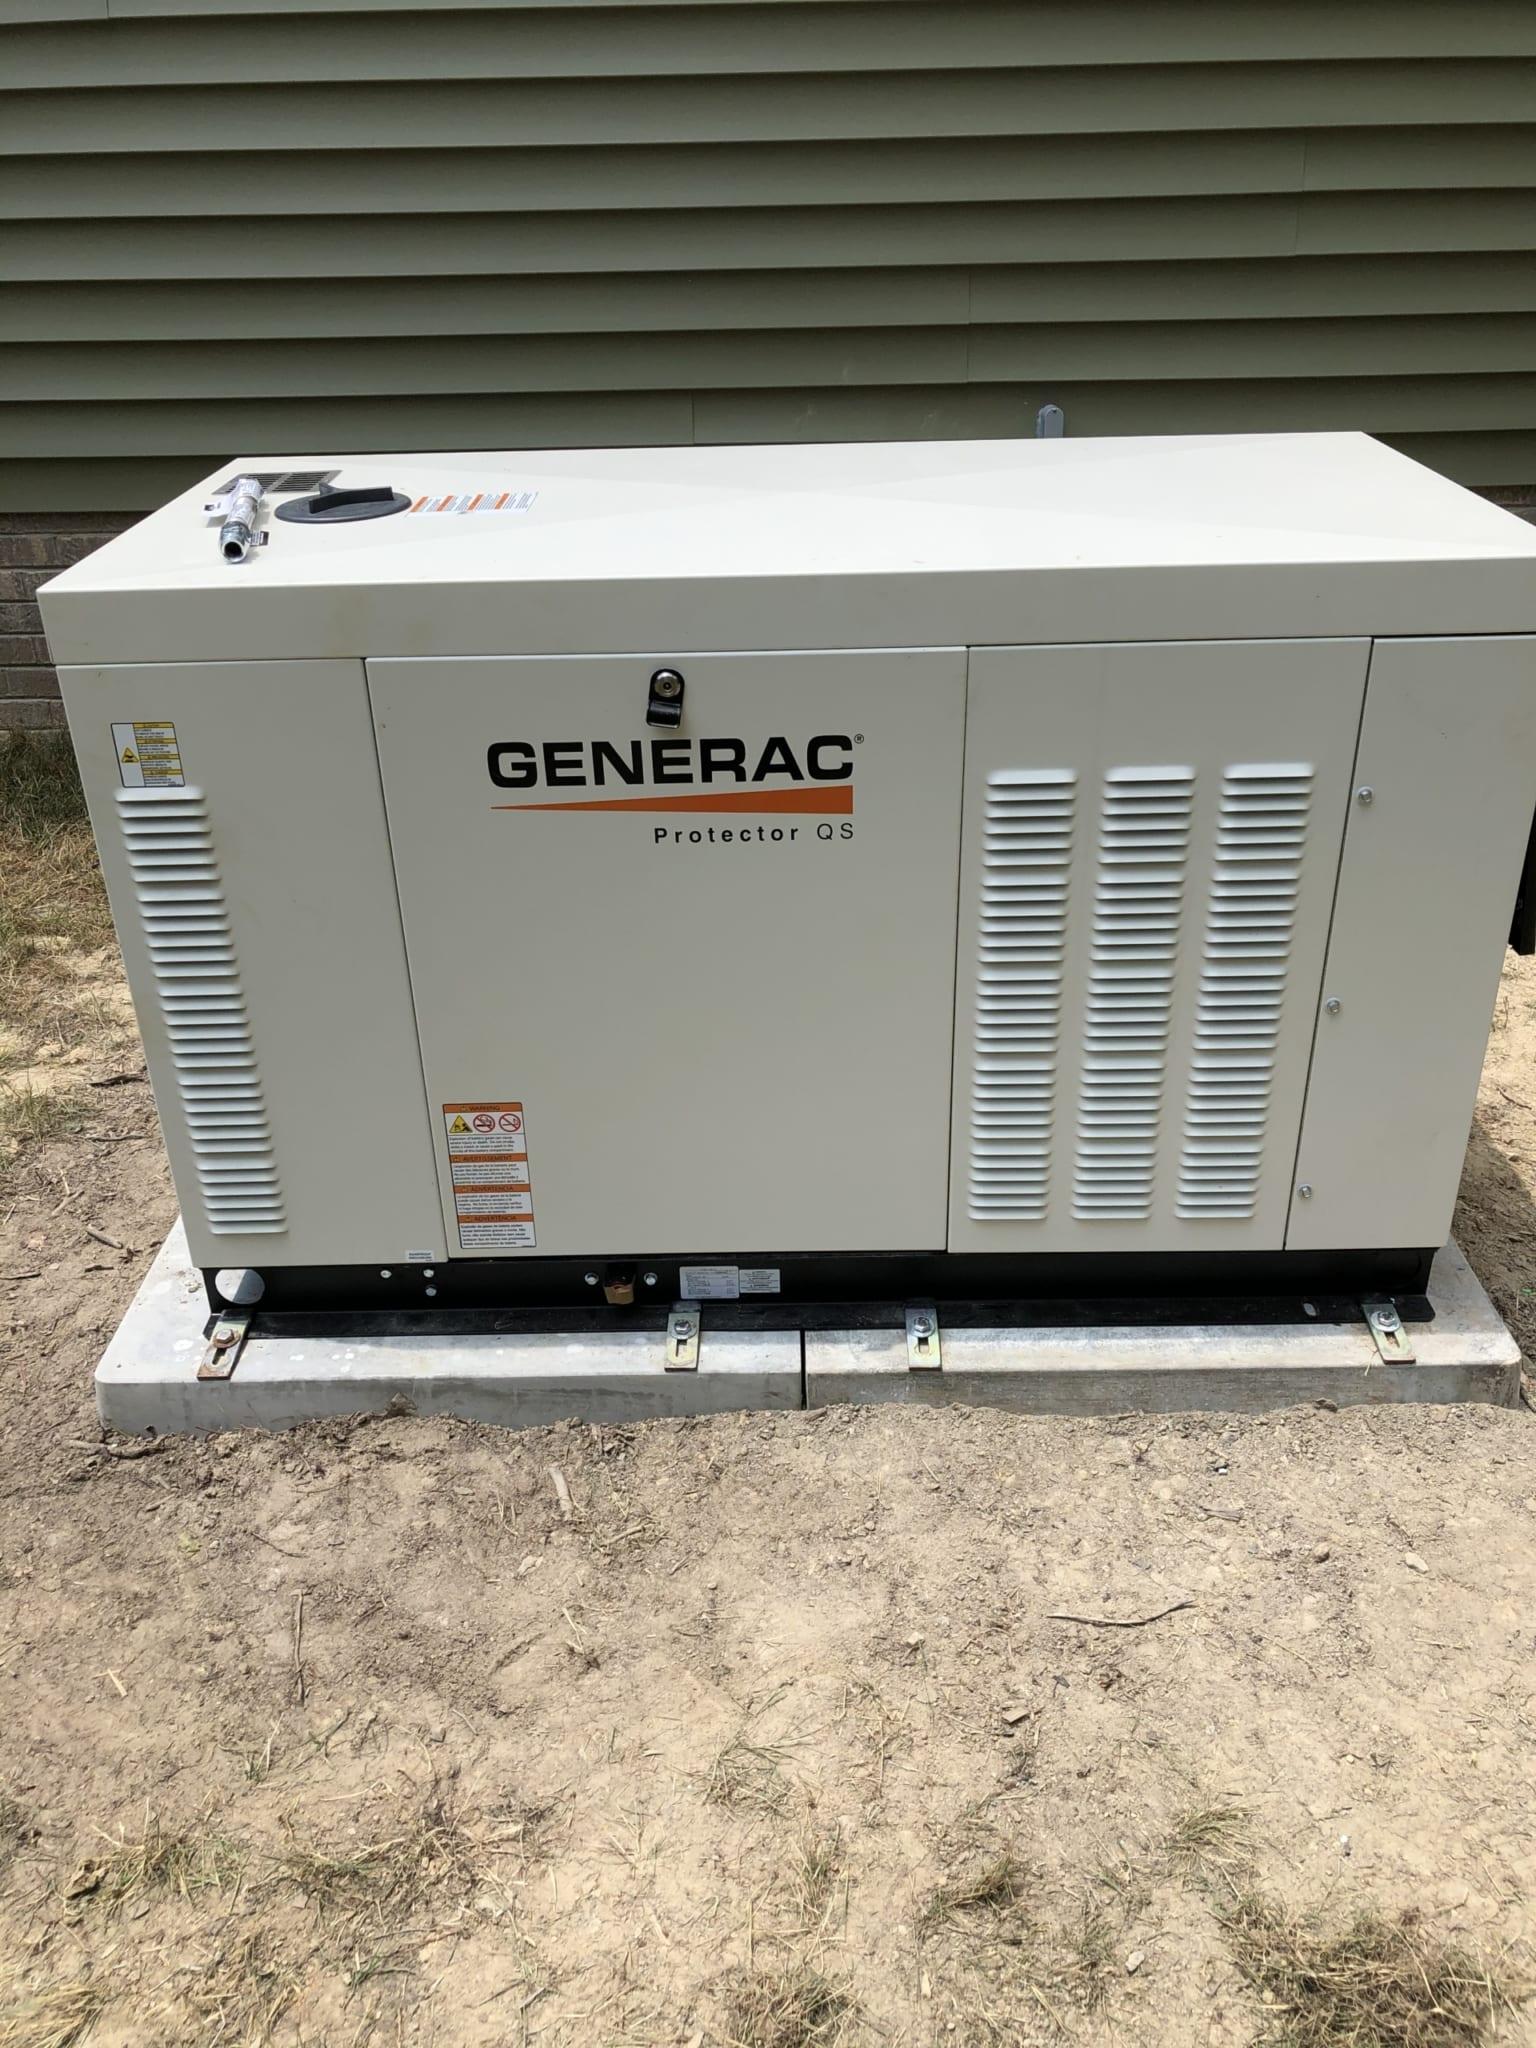 7.1.20 Amelia Generac Automatic Standby Generator